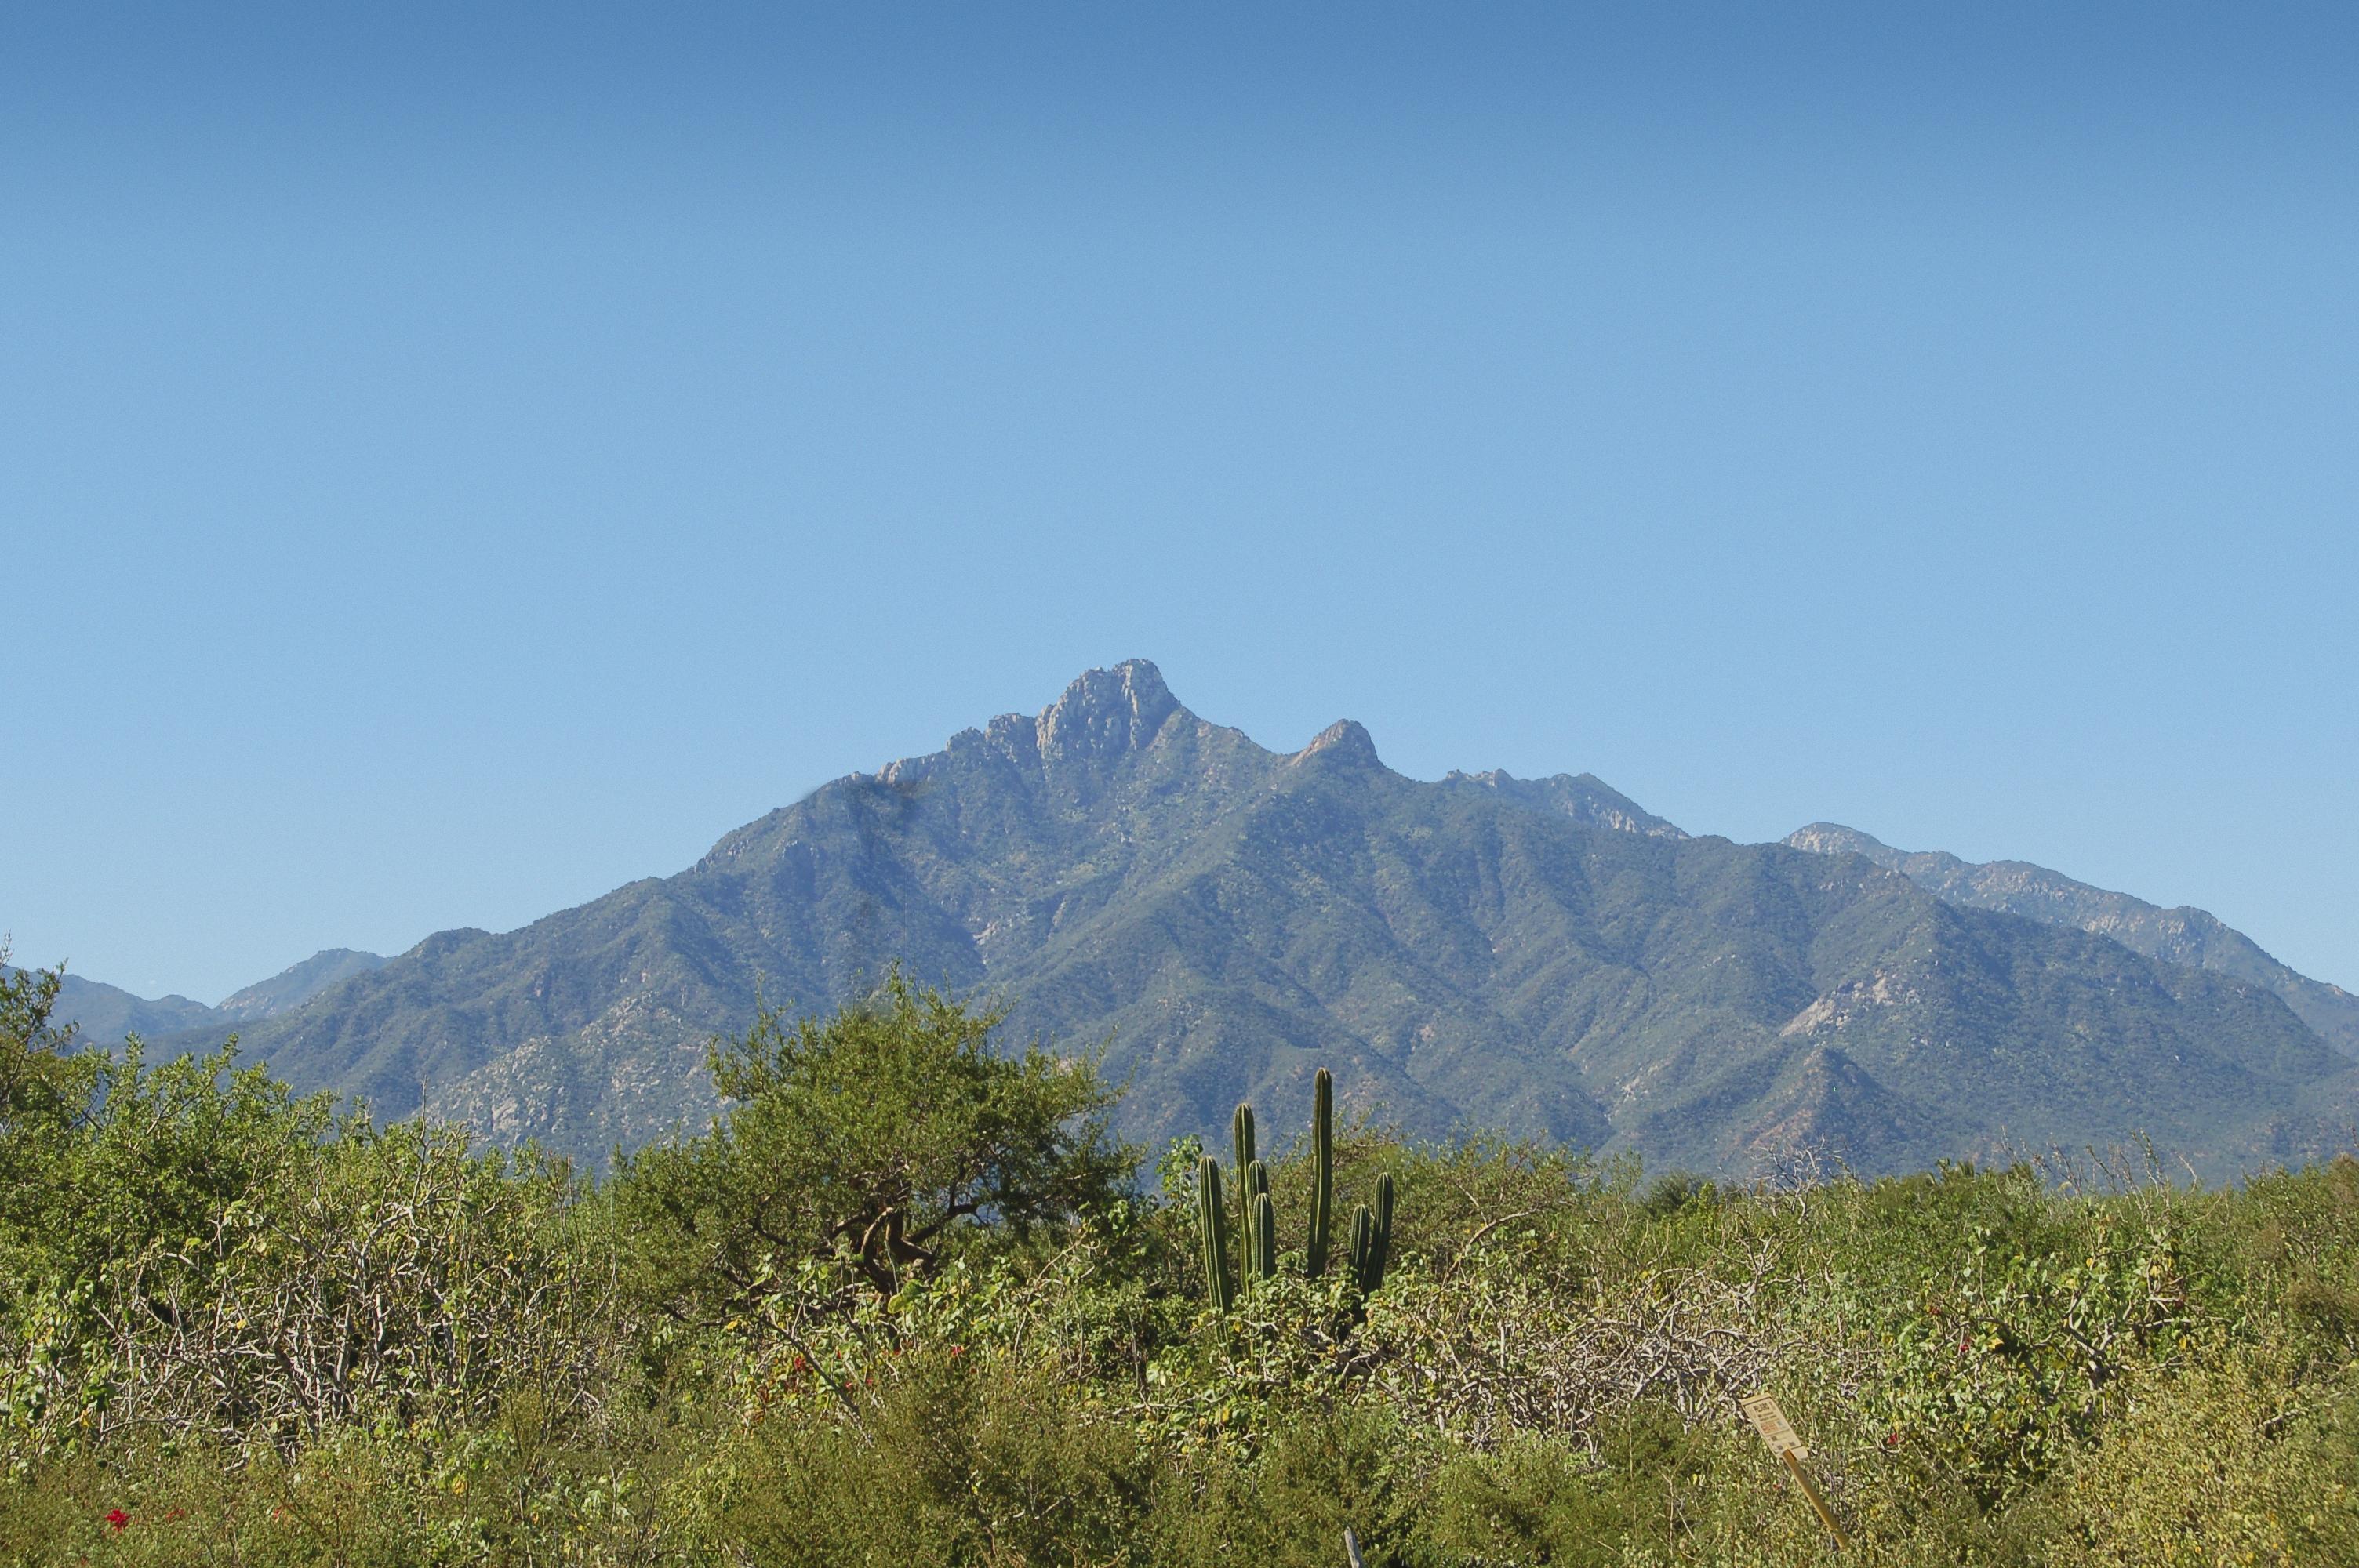 The Sierra Laguna range from Highway 1, Baja Sur